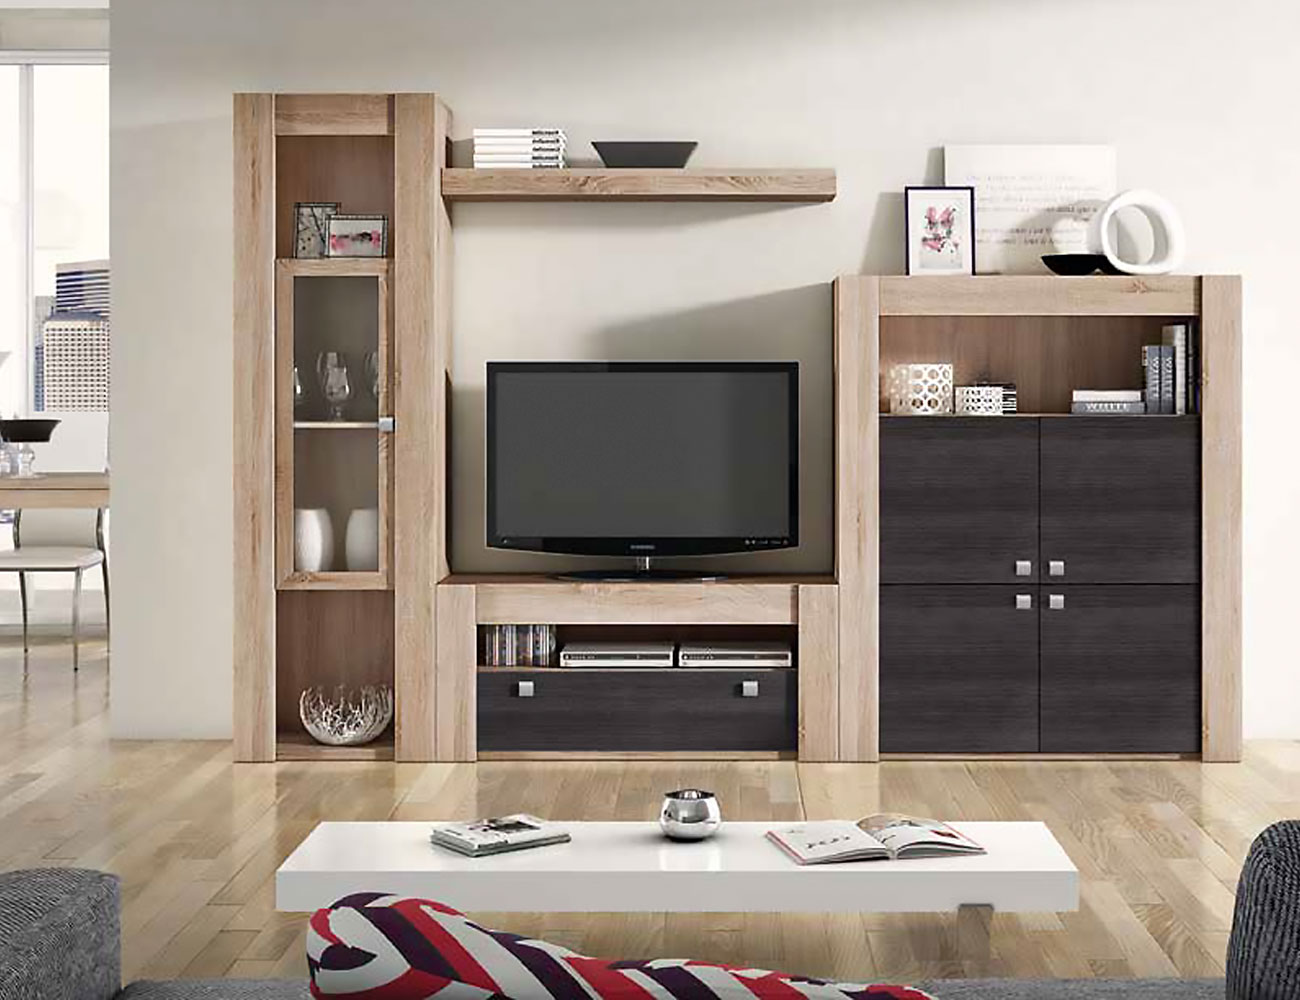 Mueble salon moderno comp05c1